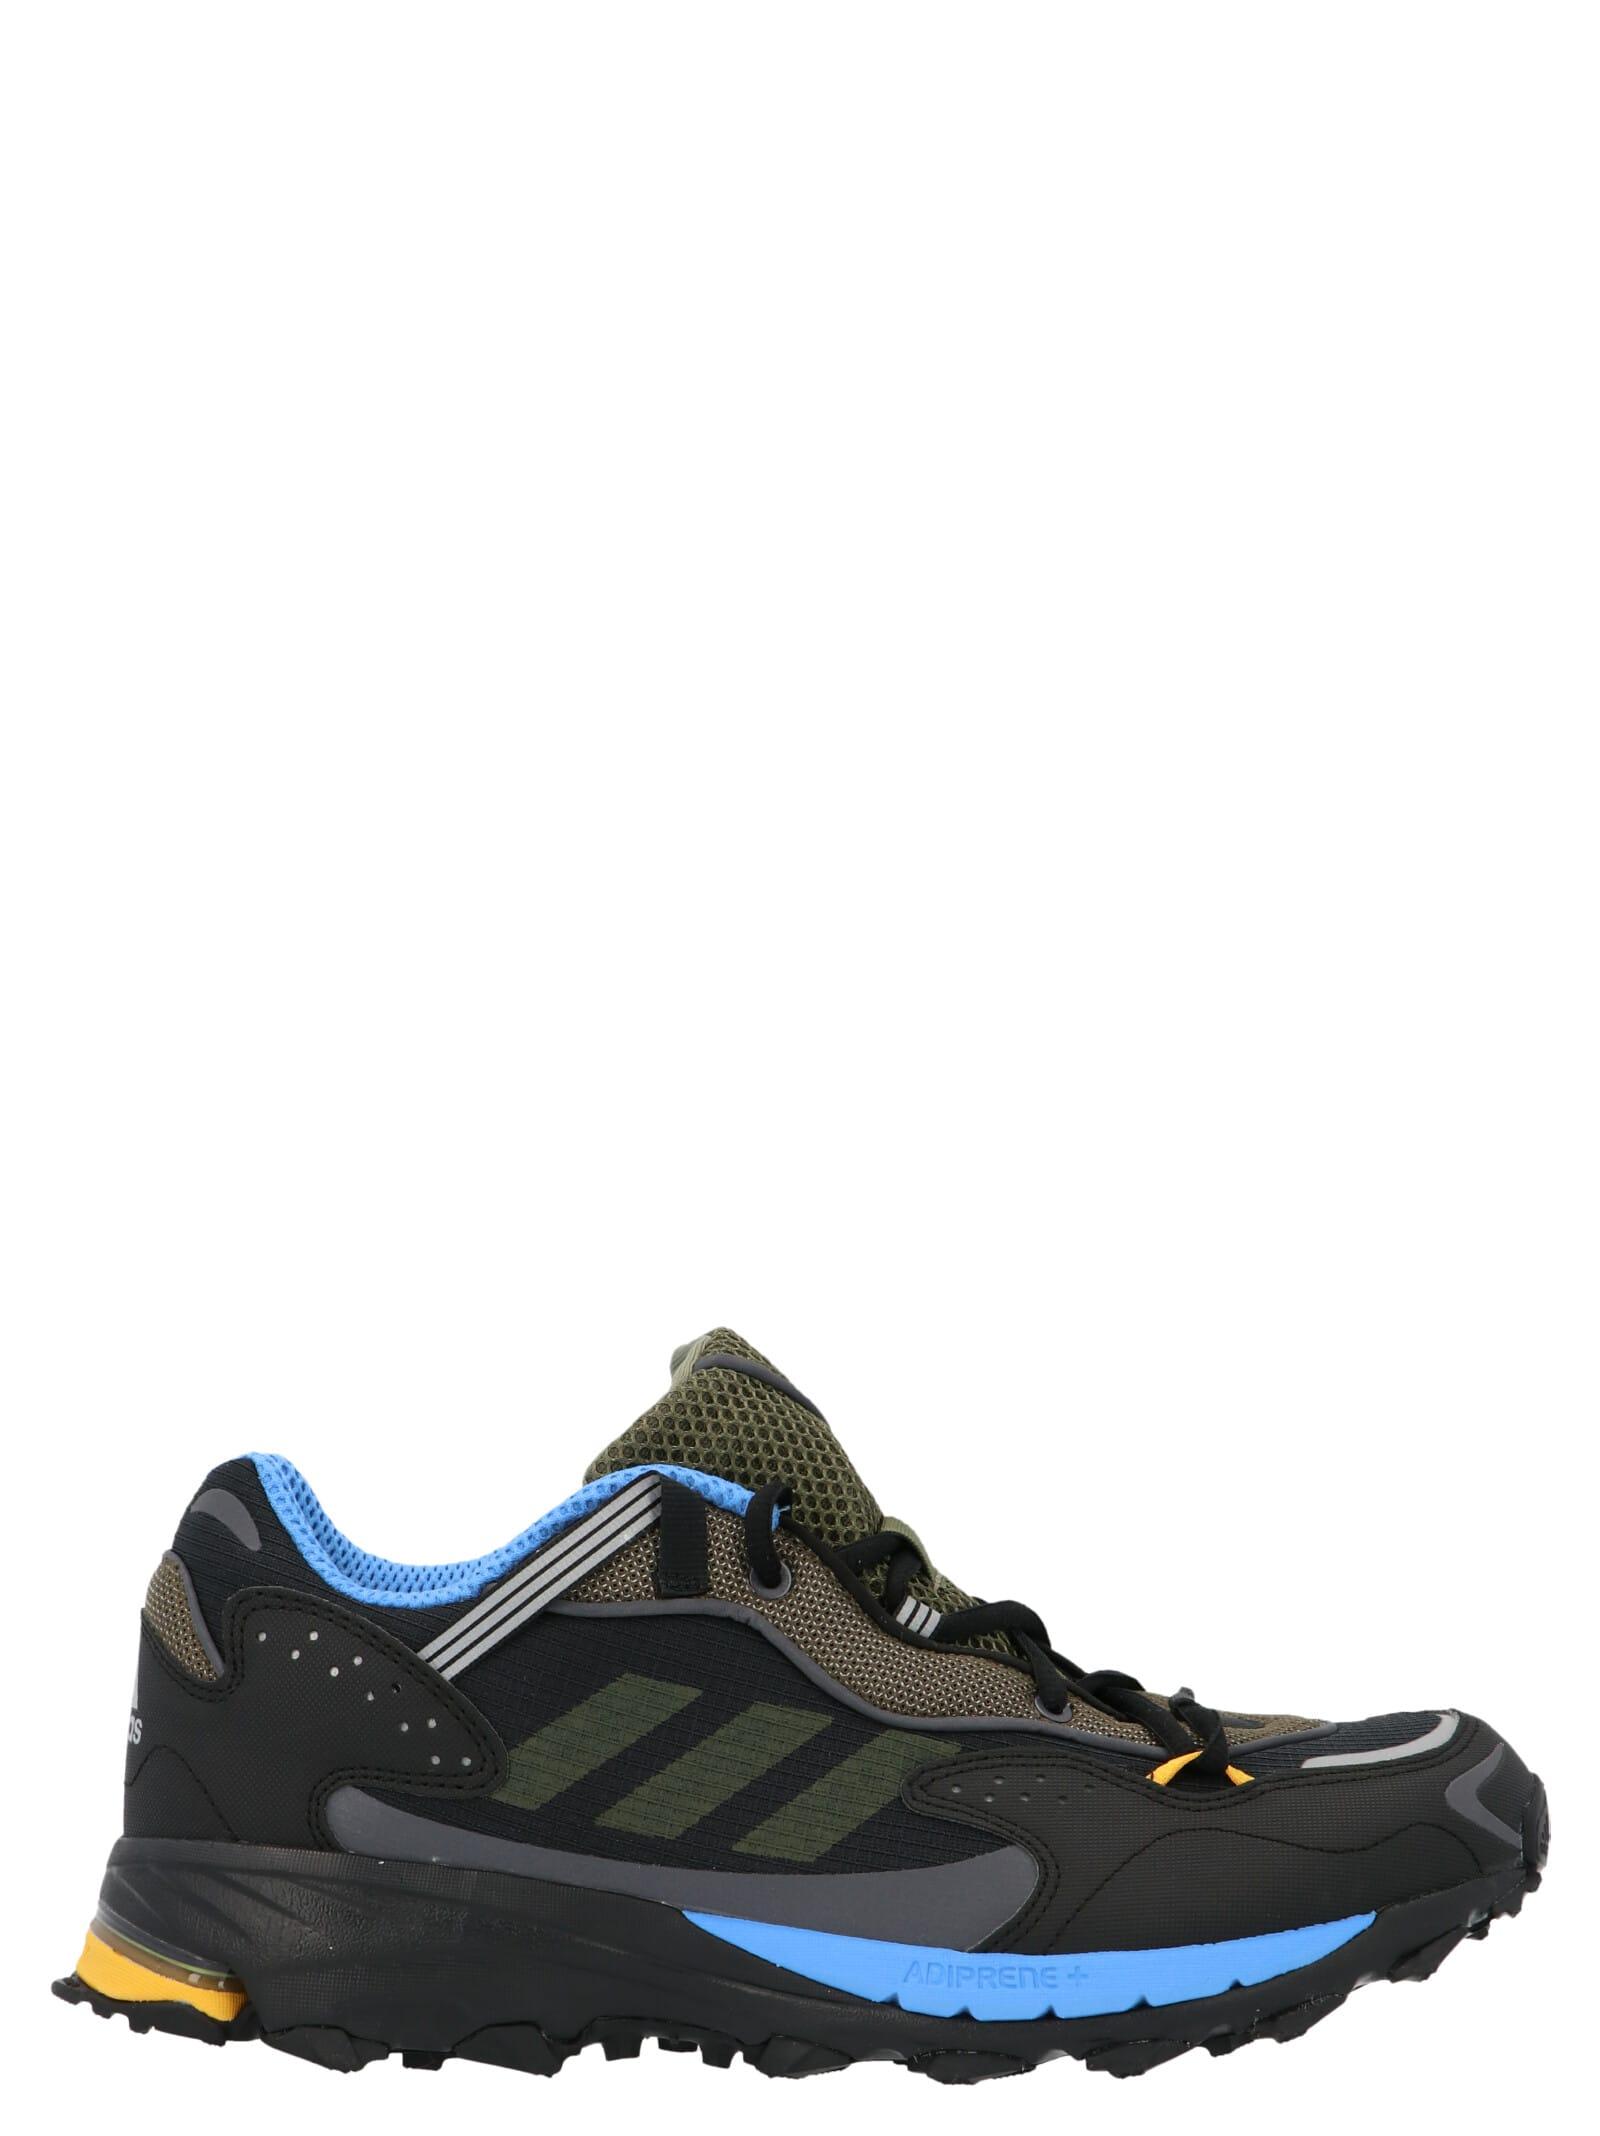 Adidas Originals response Hoverture Gf6100 Am Shoes